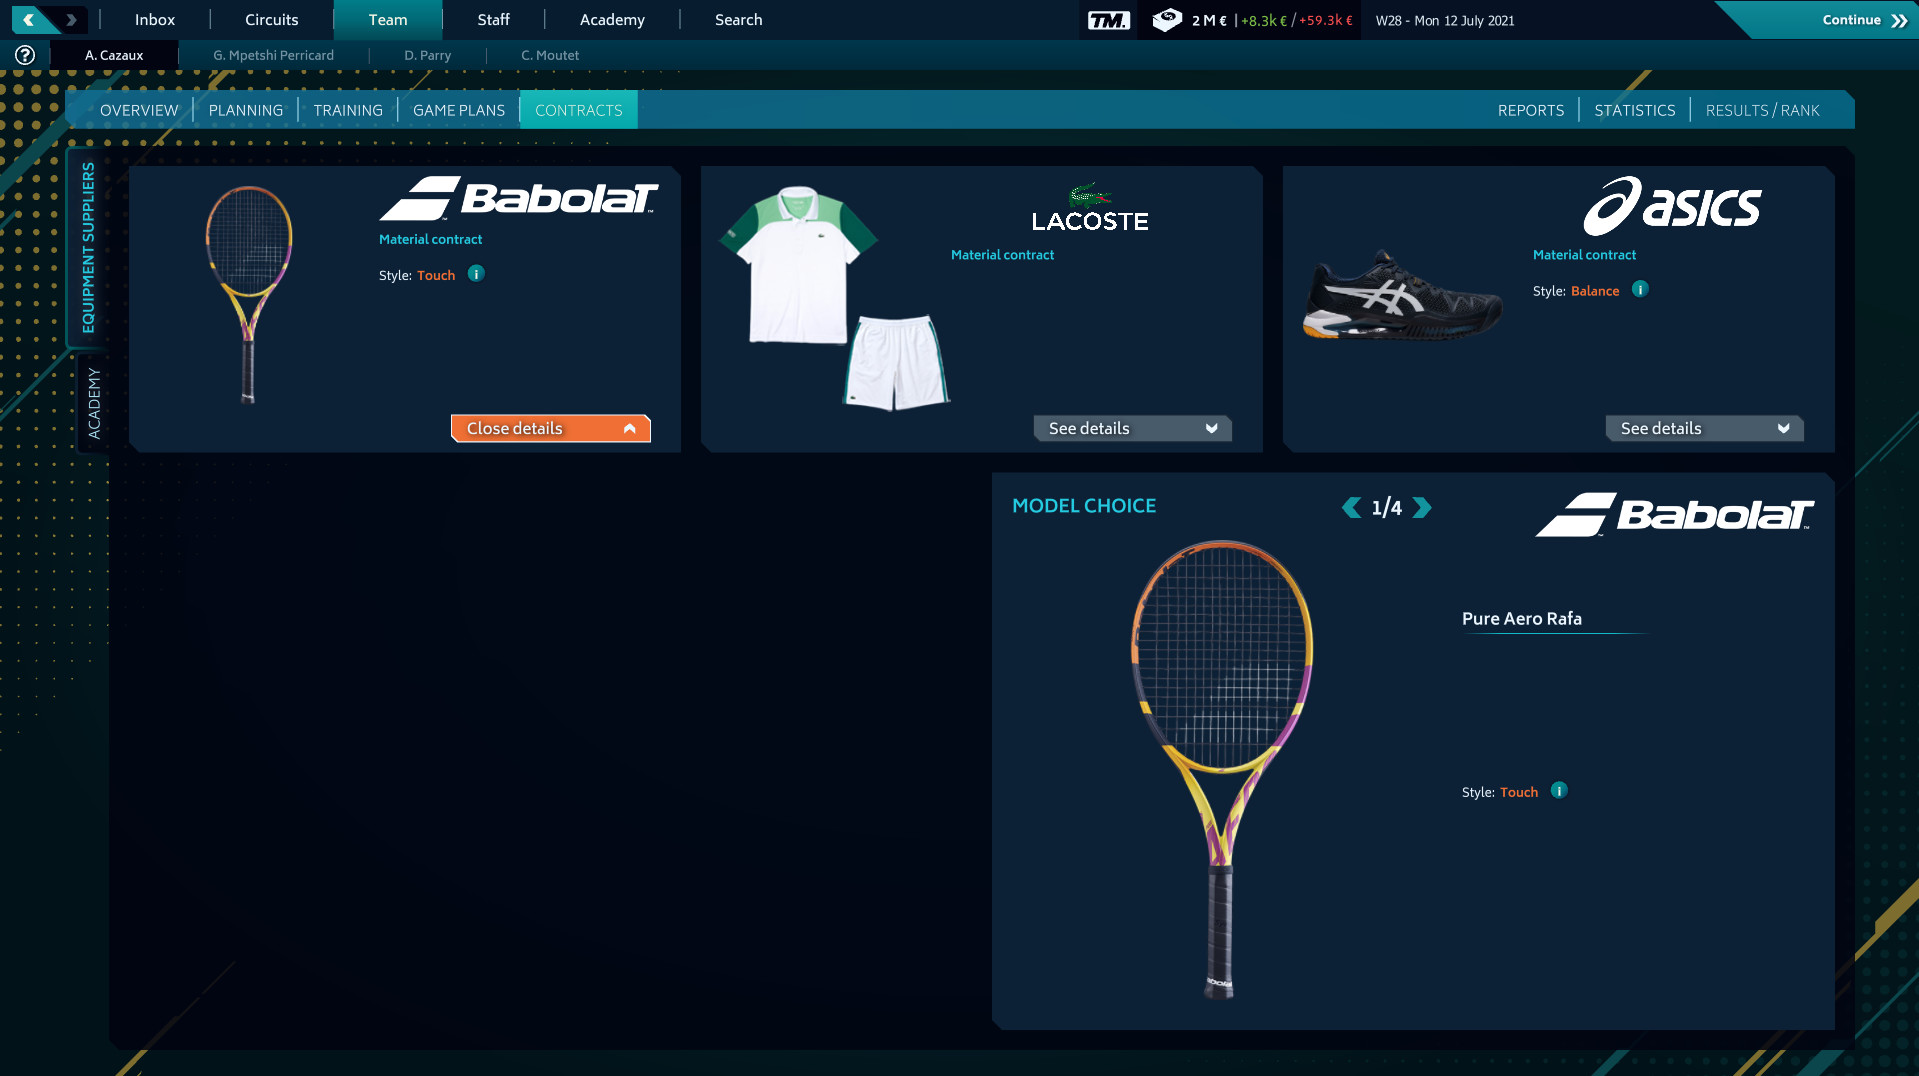 Tennis Manager 2021 Fiyat Karşılaştırma